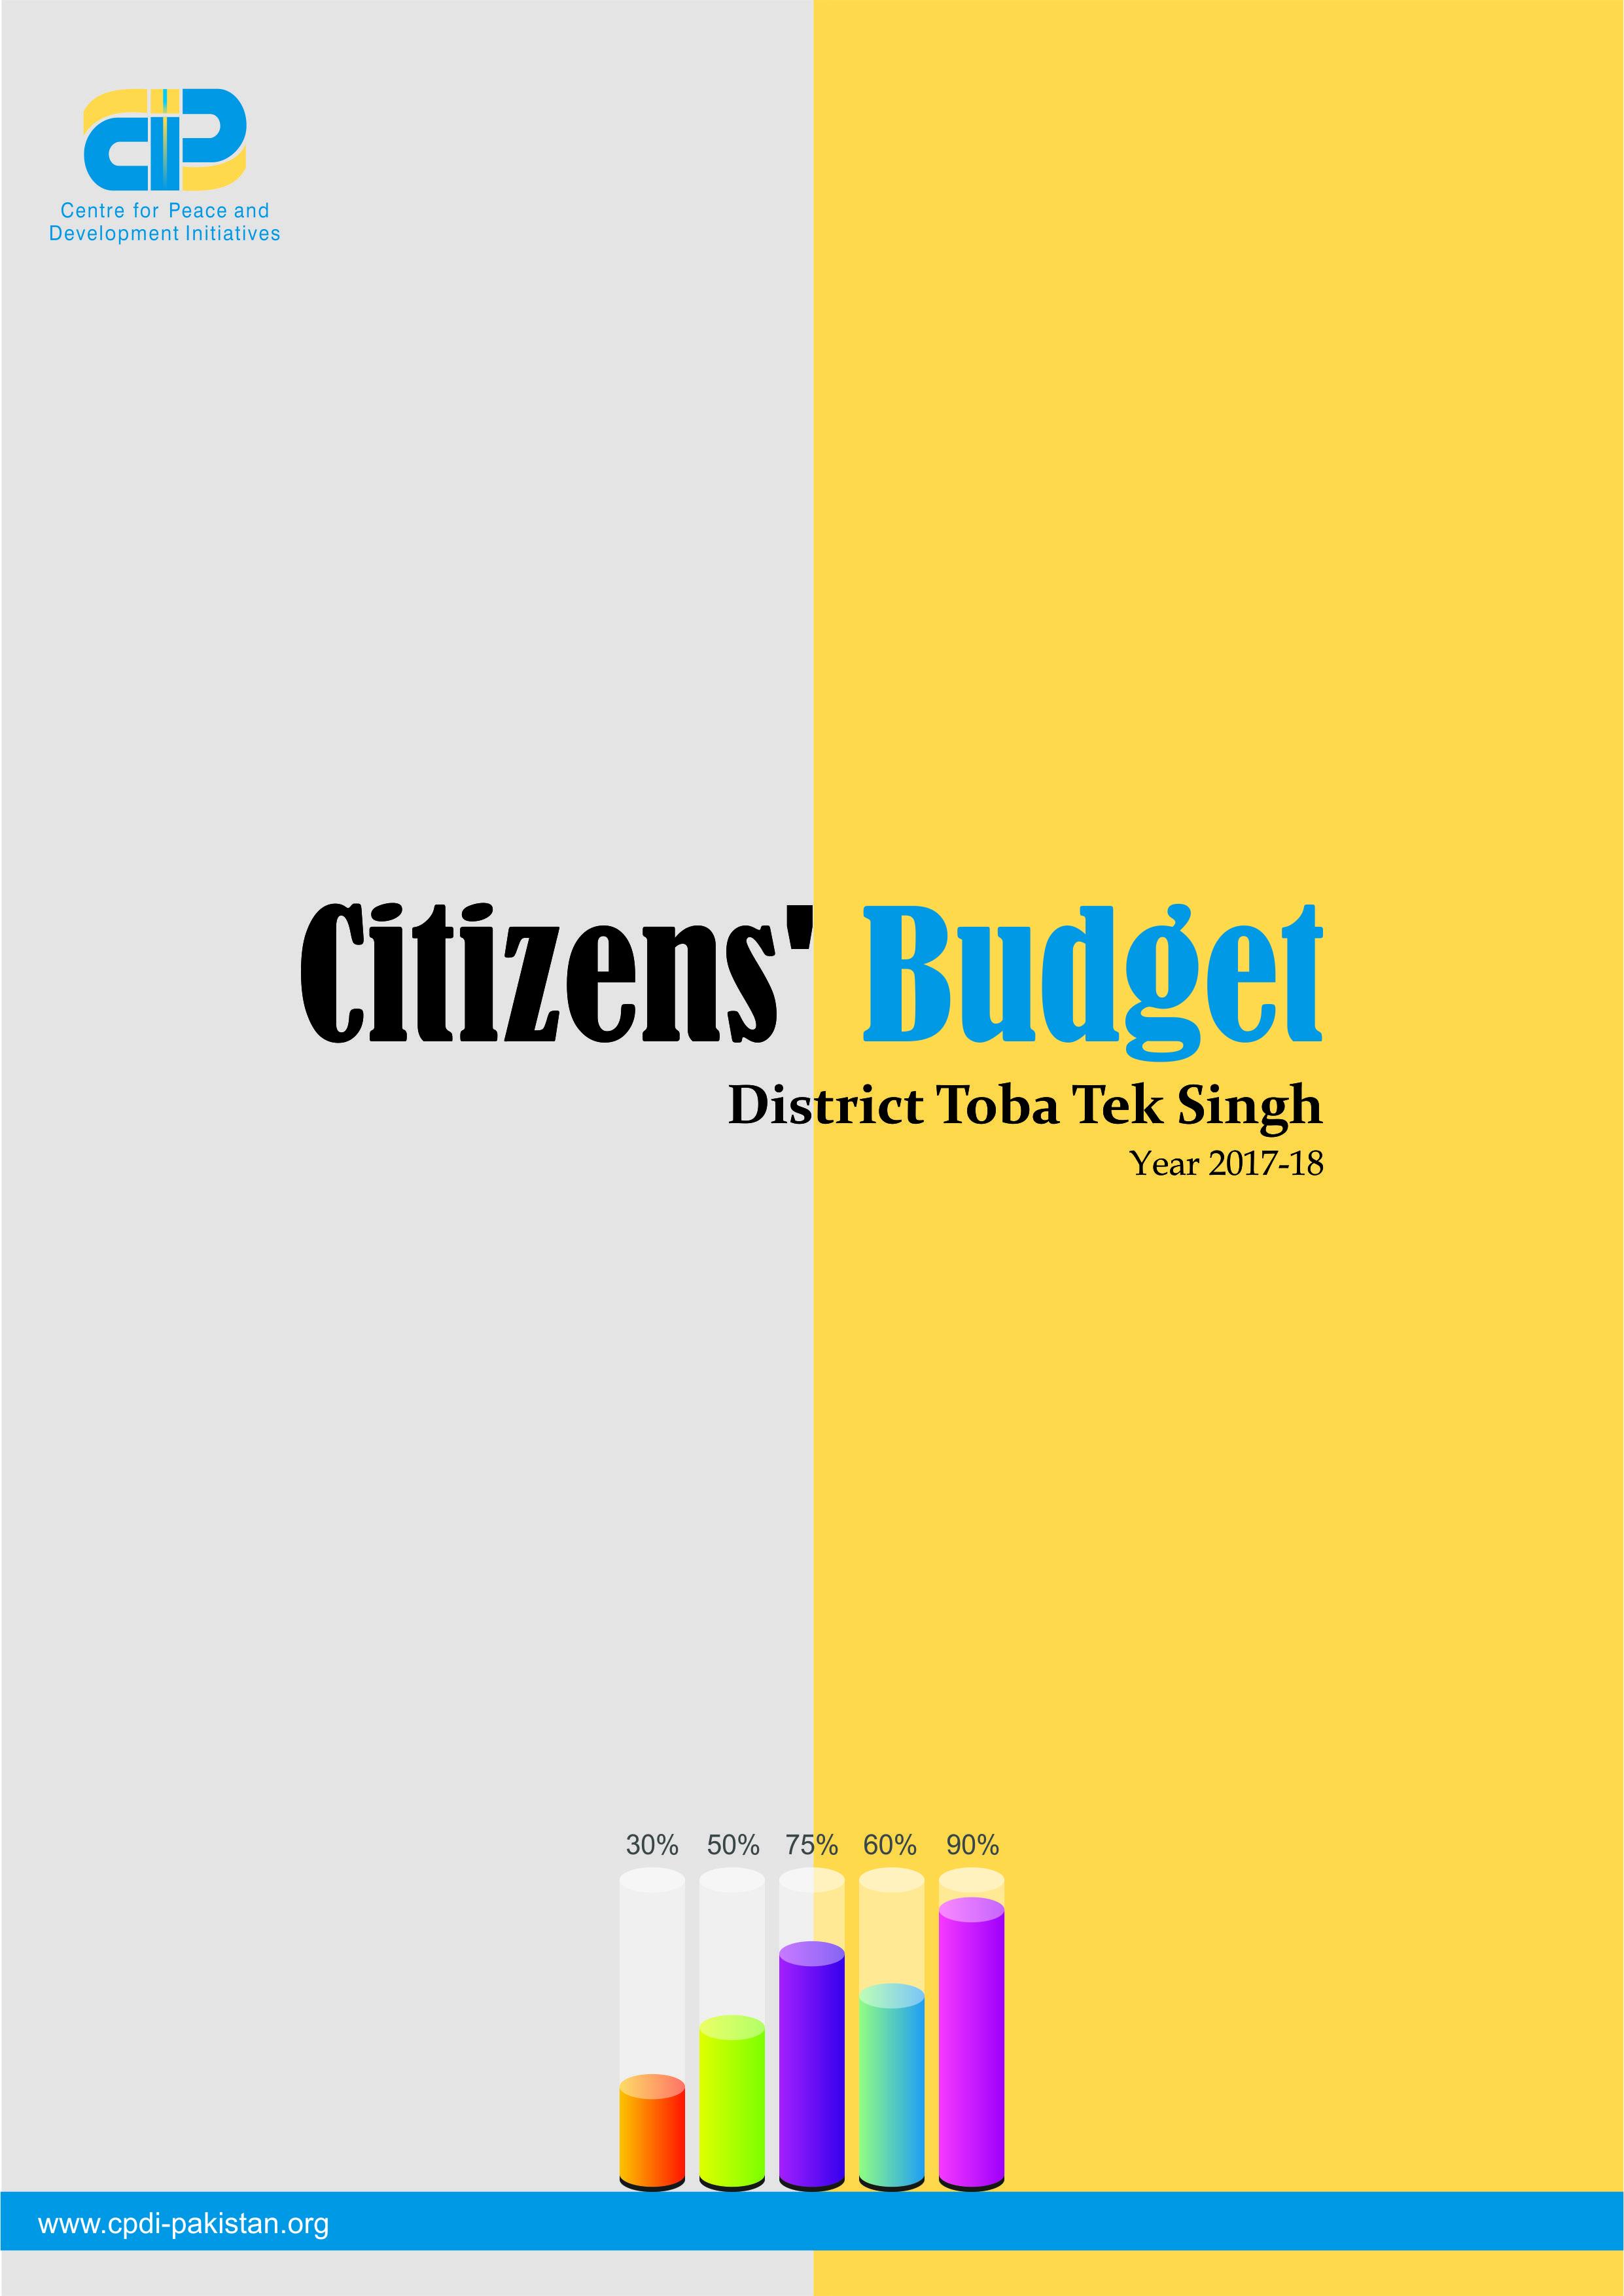 Citizens' Budget District Toba Tek Singh Year 2017-18